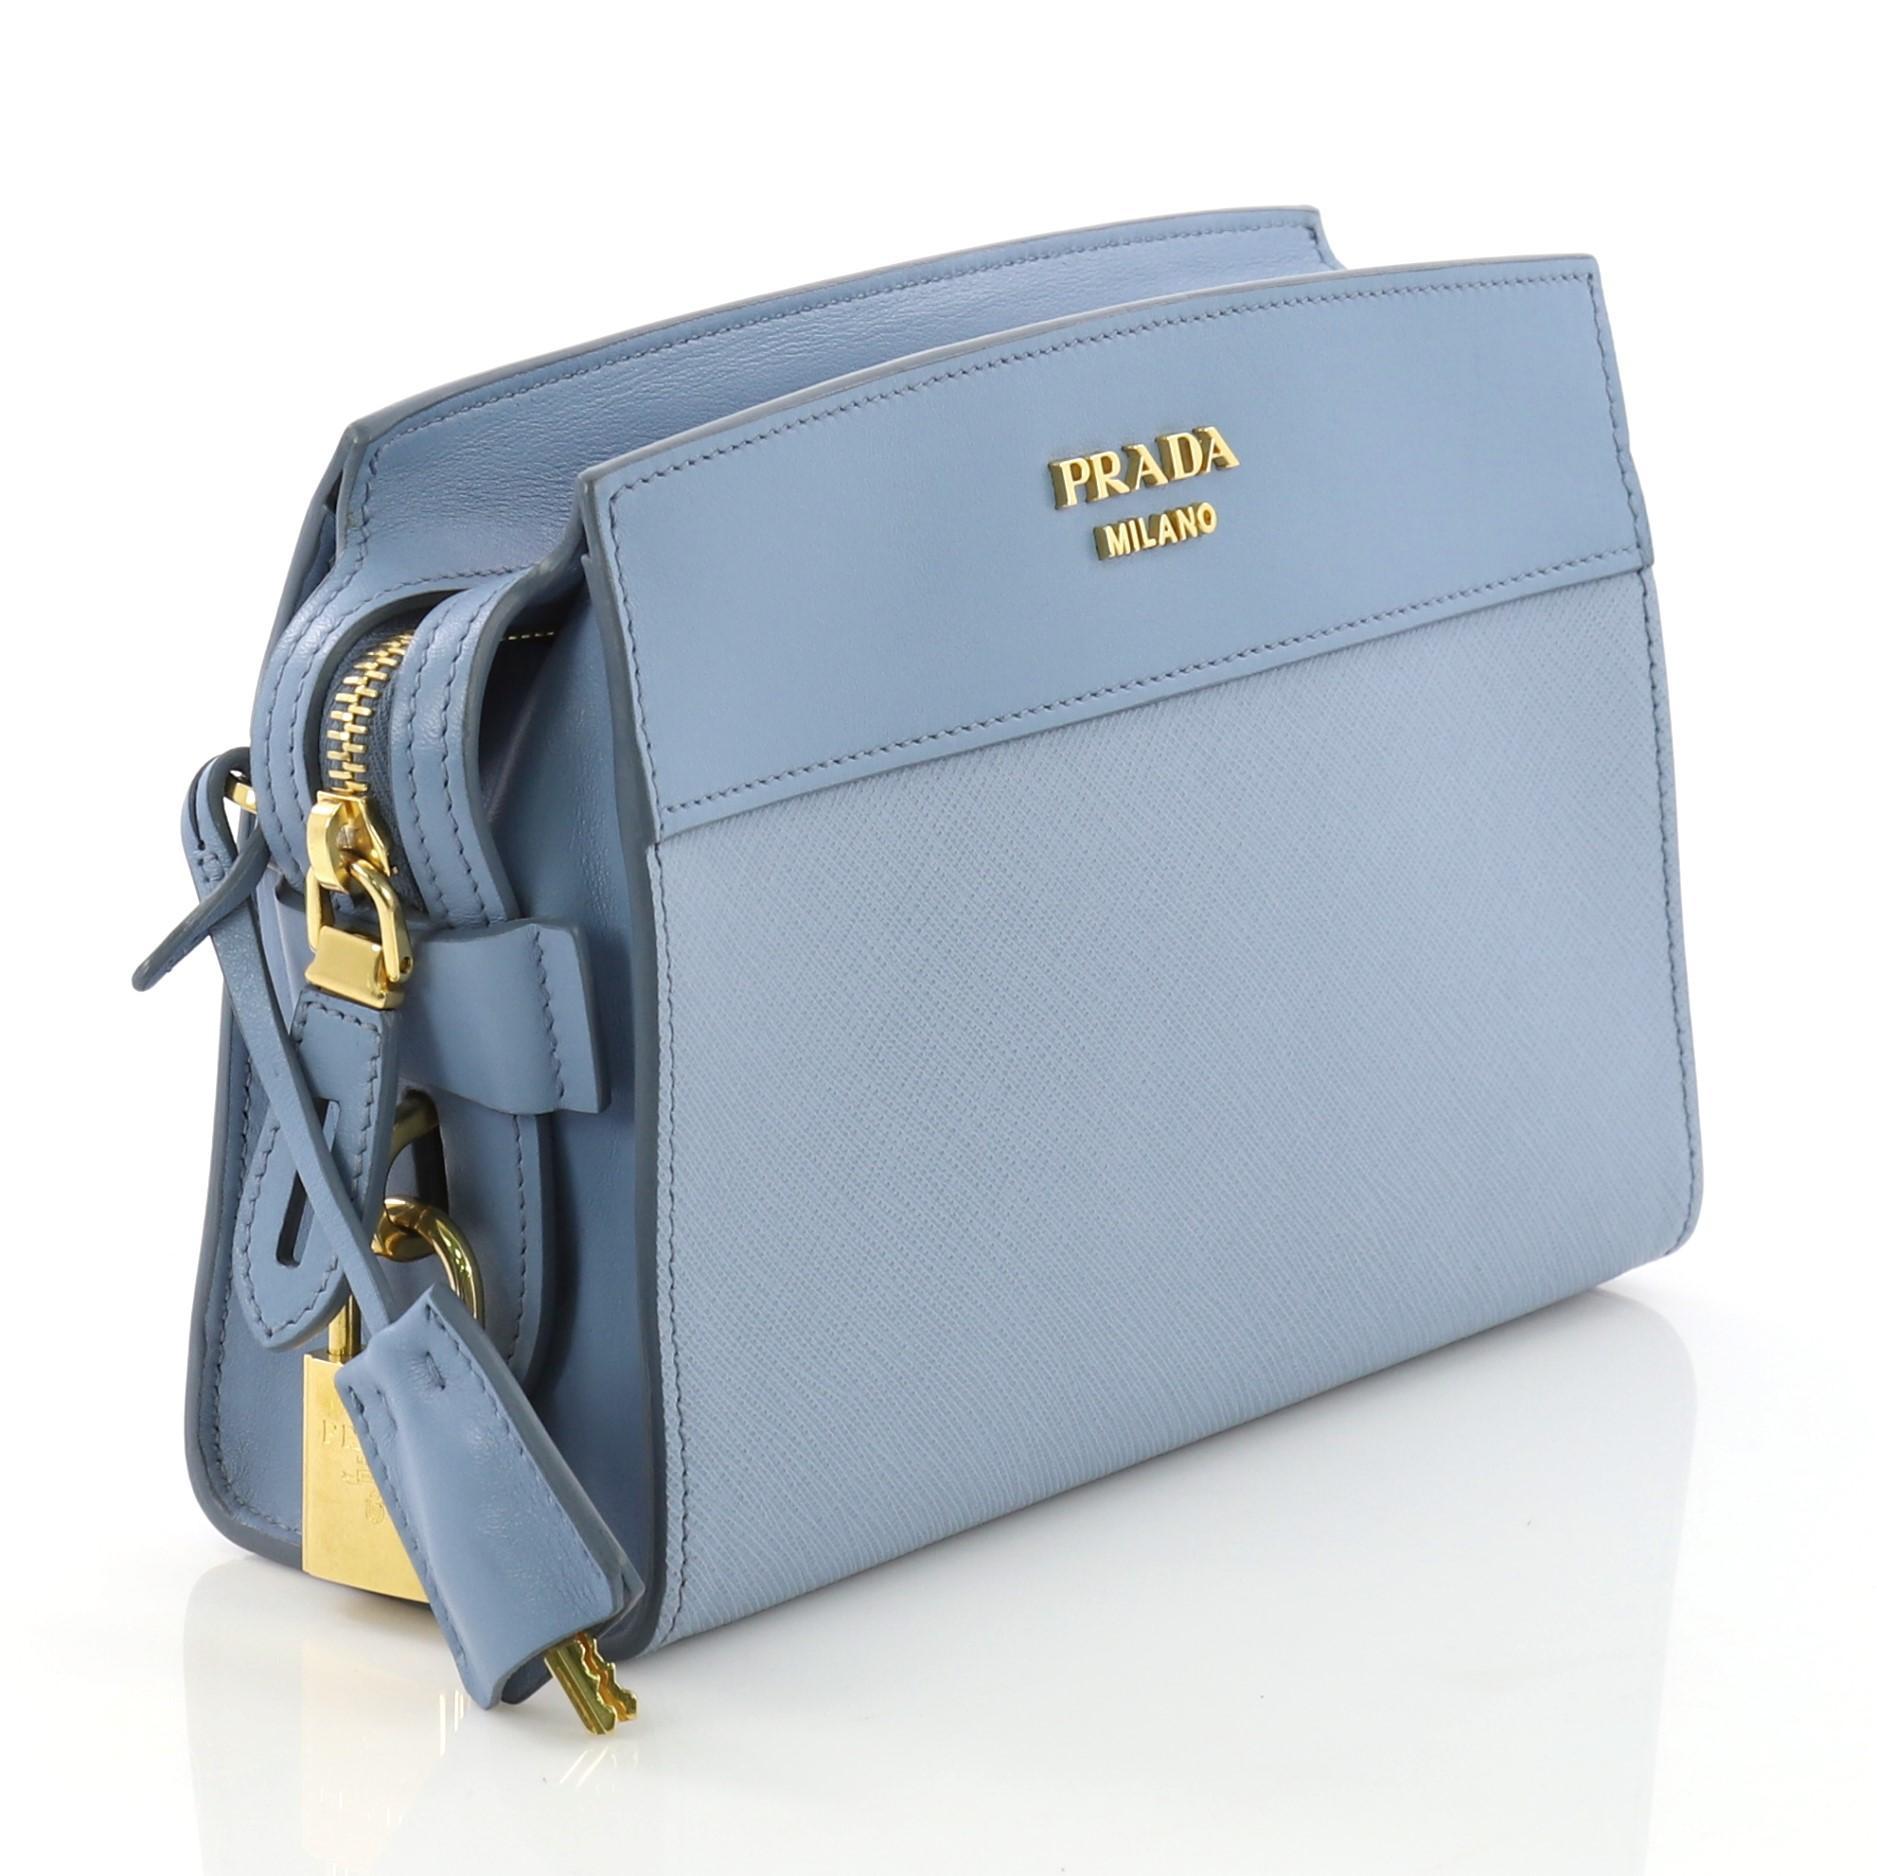 7a7a6a2587 Prada Esplanade Crossbody Bag Saffiano Leather Small For Sale at 1stdibs